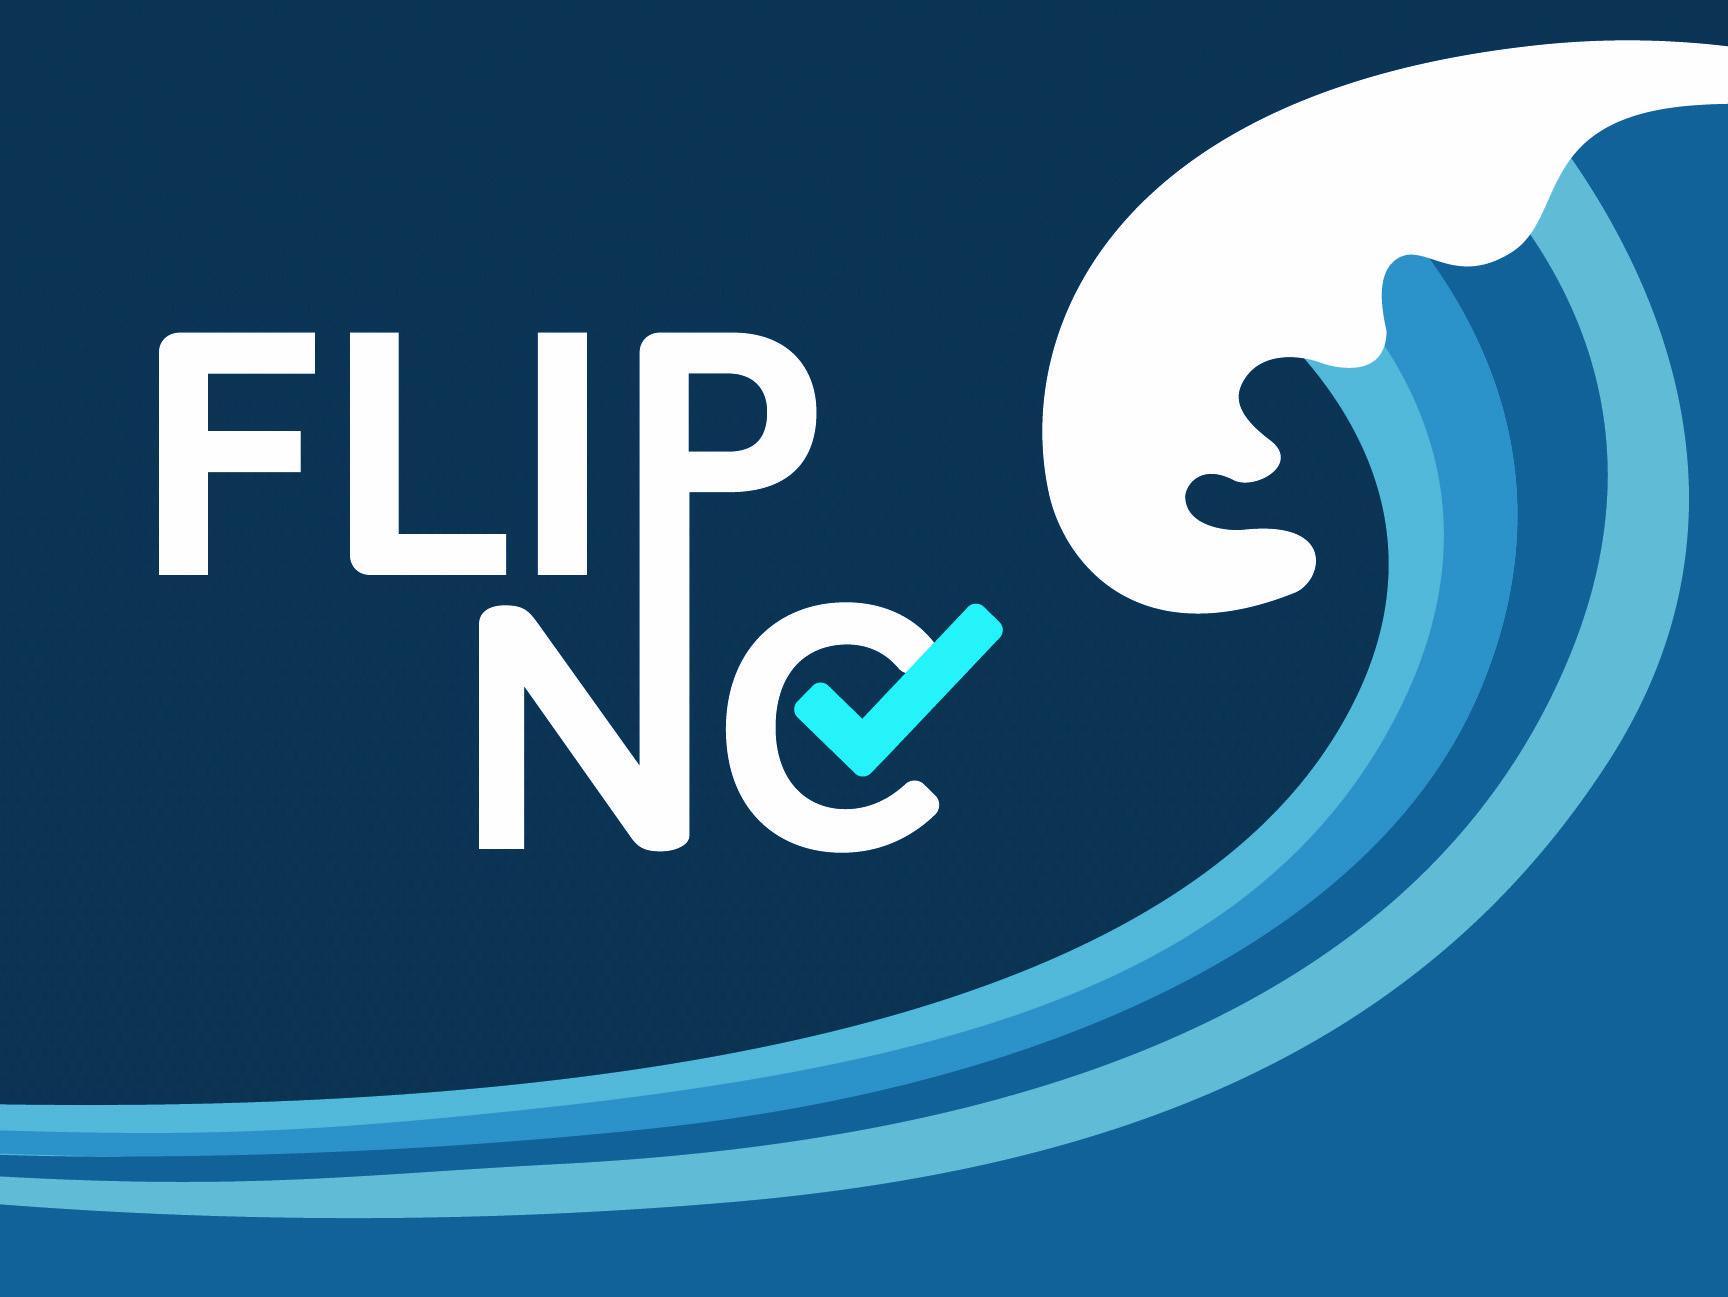 FLIP NC blue wave.jpeg